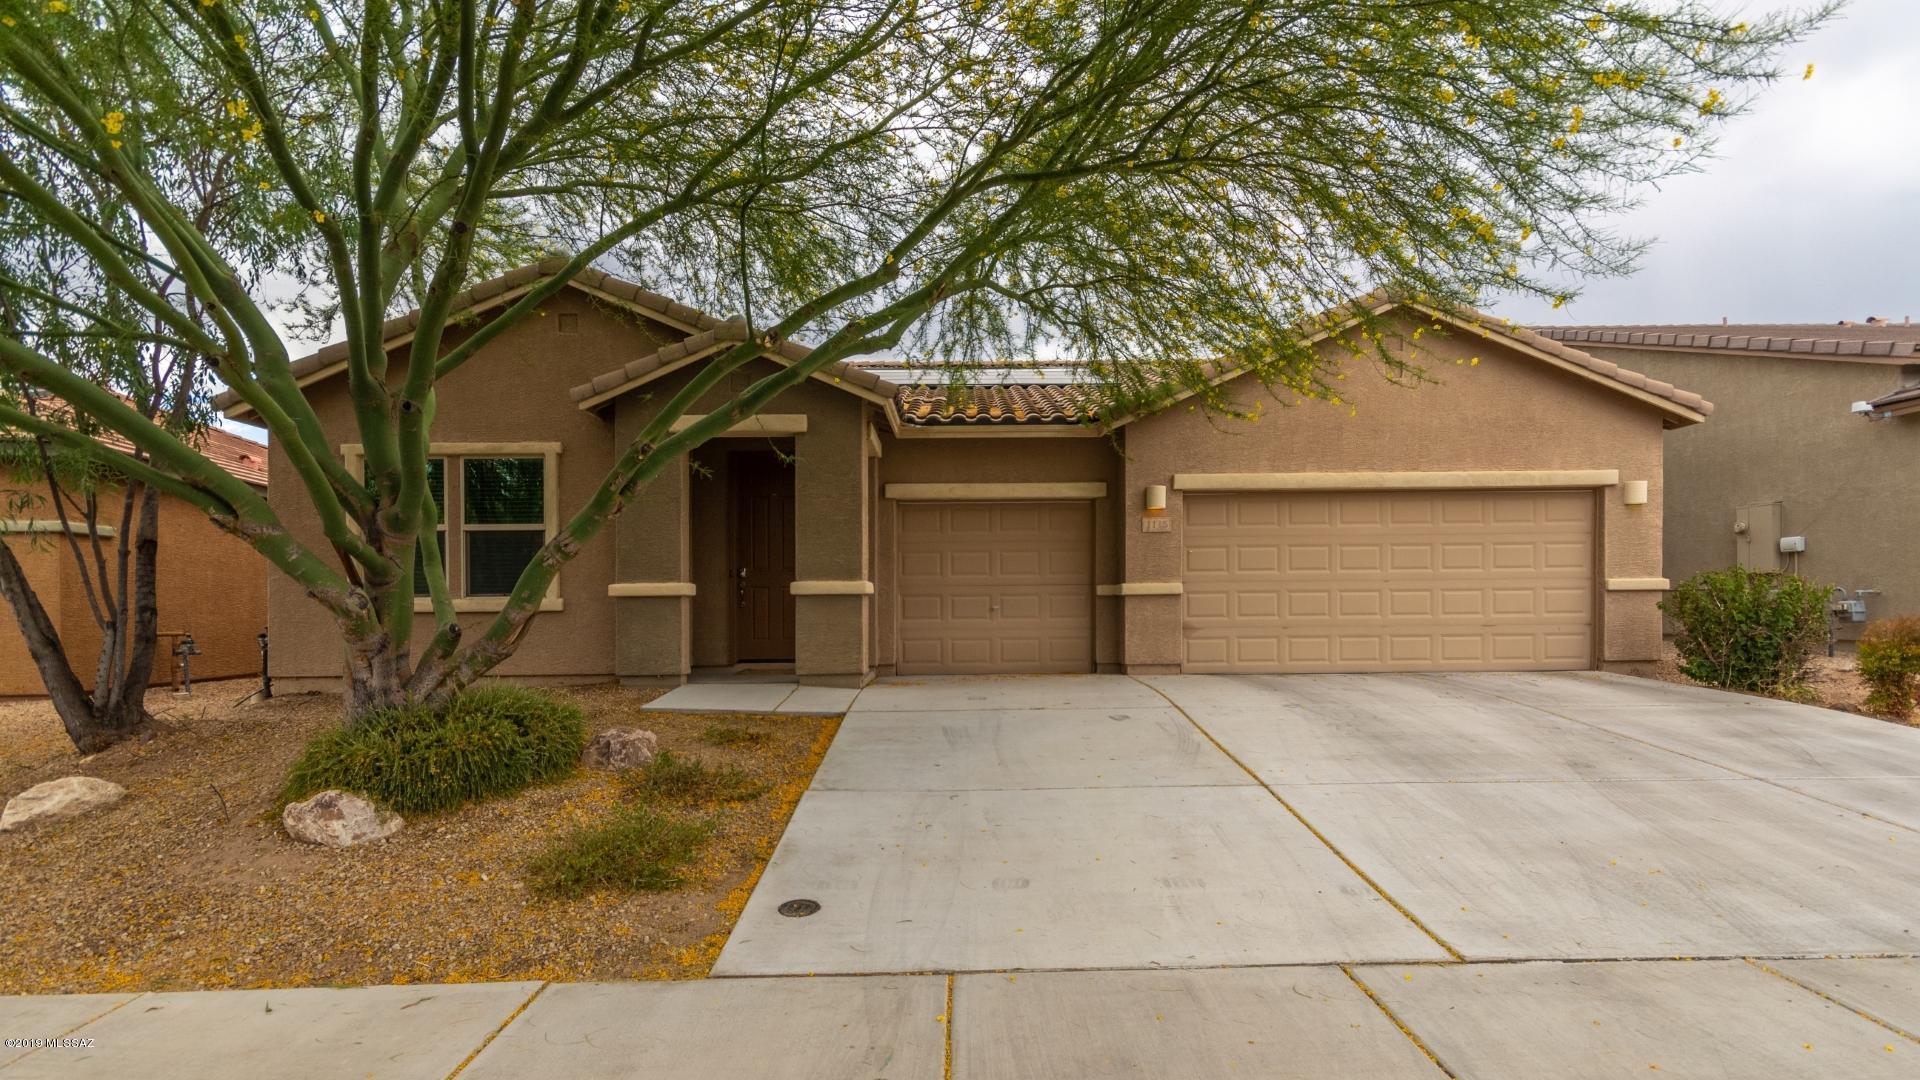 Photo of 1115 E Cotton Field Lane, Sahuarita, AZ 85629